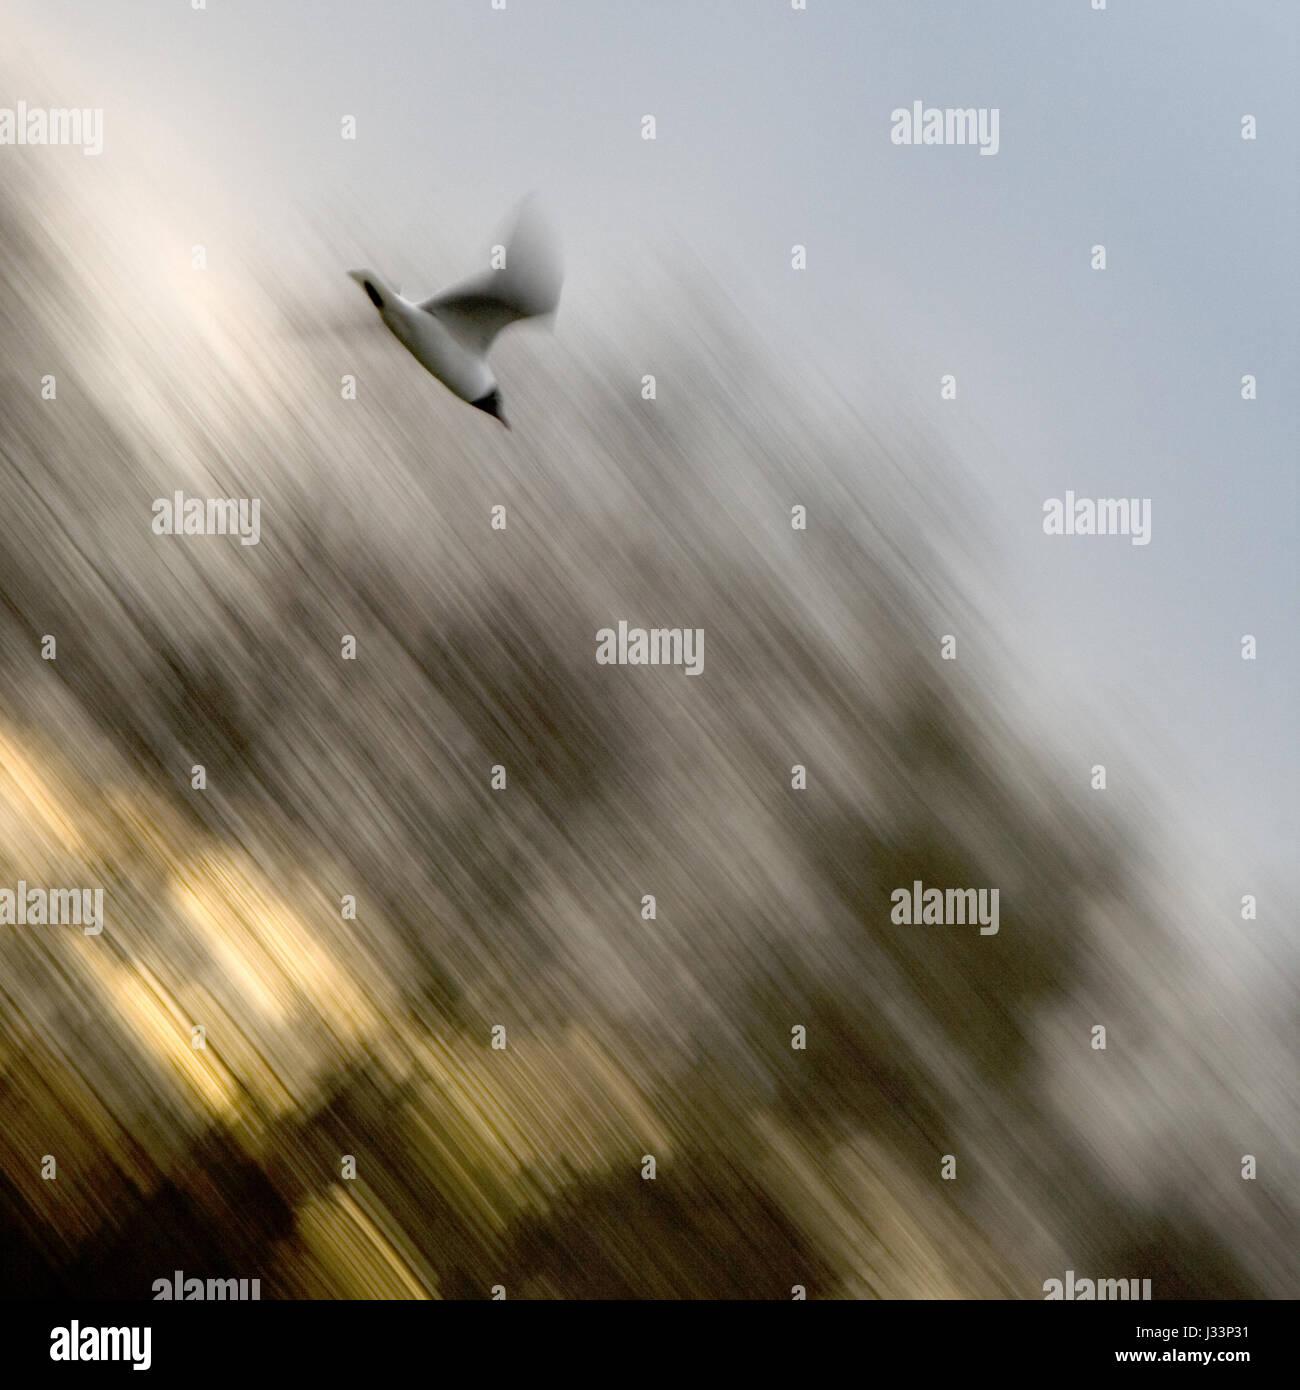 Fast gull bird swiftly attacks. A dynamic scene. - Stock Image